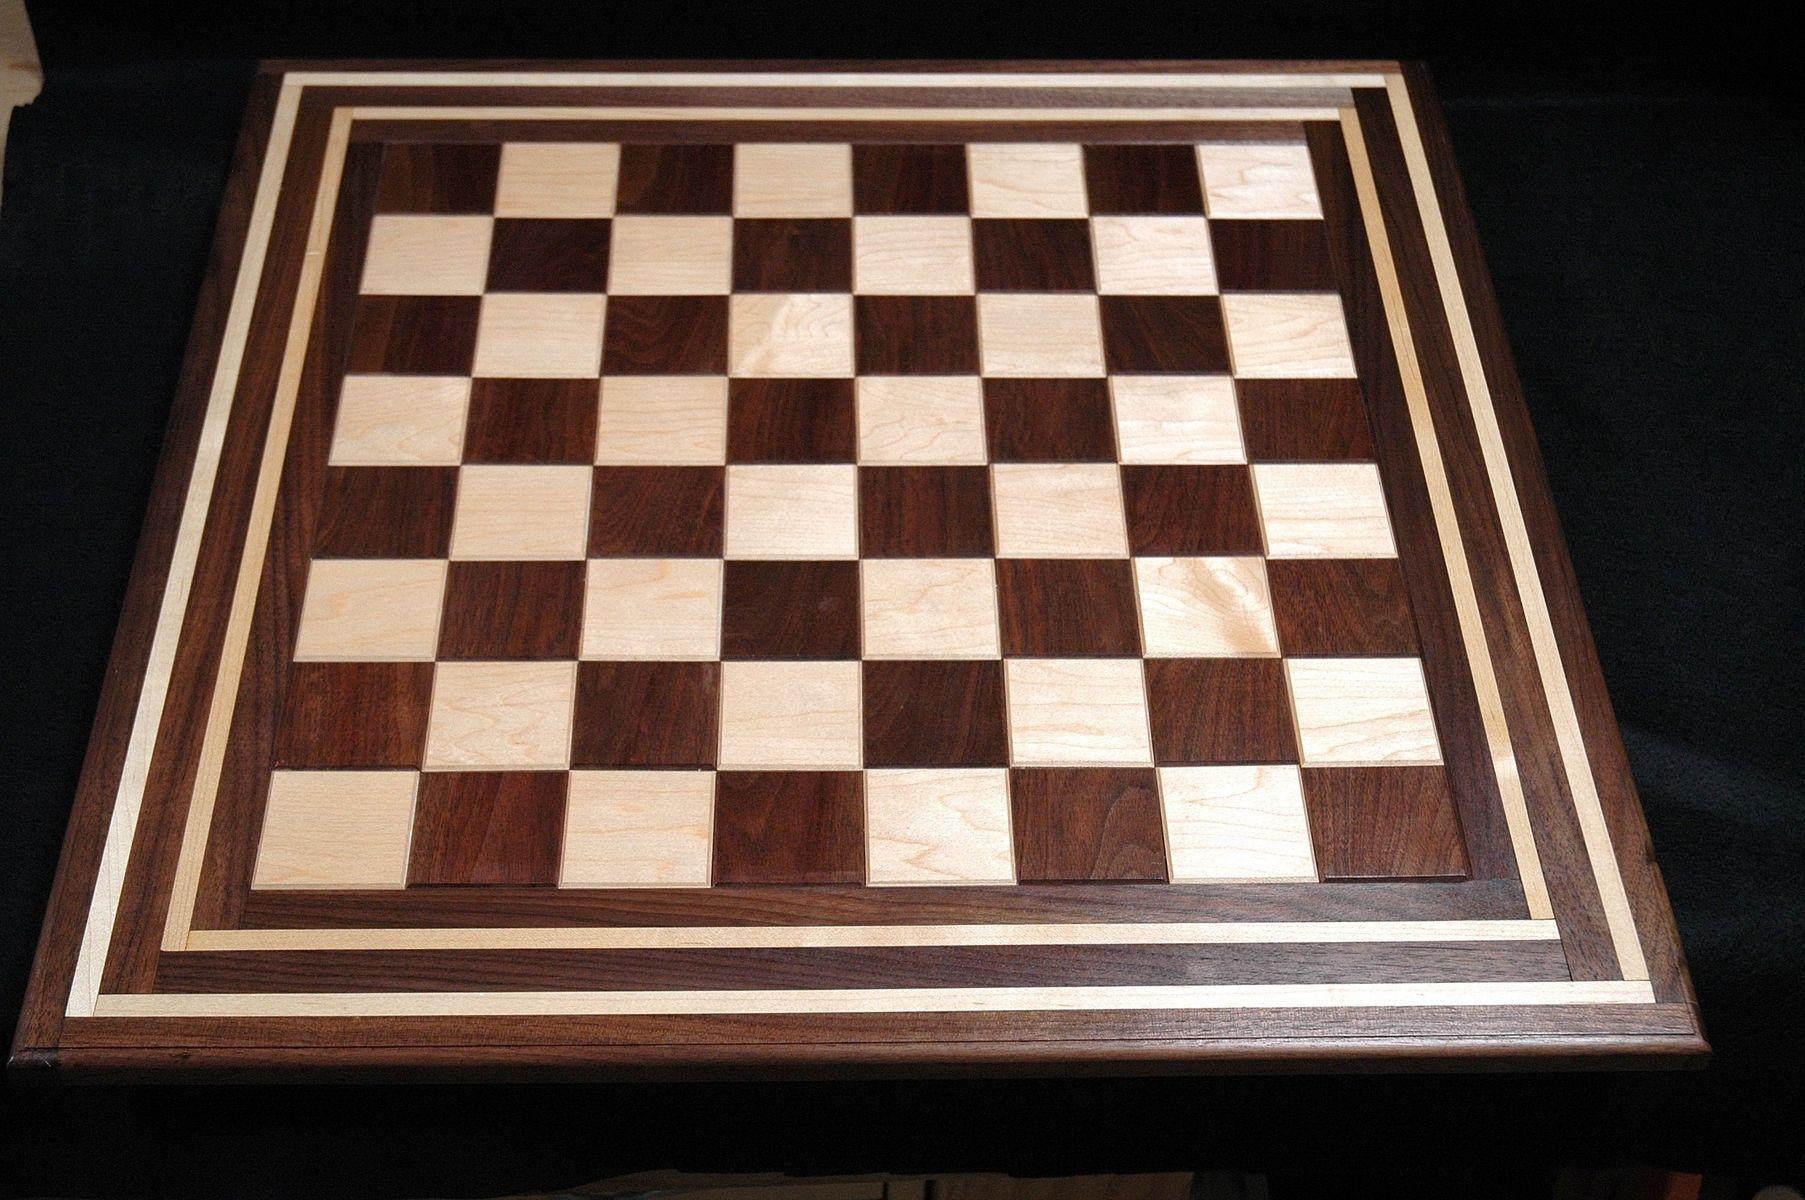 Custom Chess Board Design 4 By Wooden It Be Nice Custommadecom